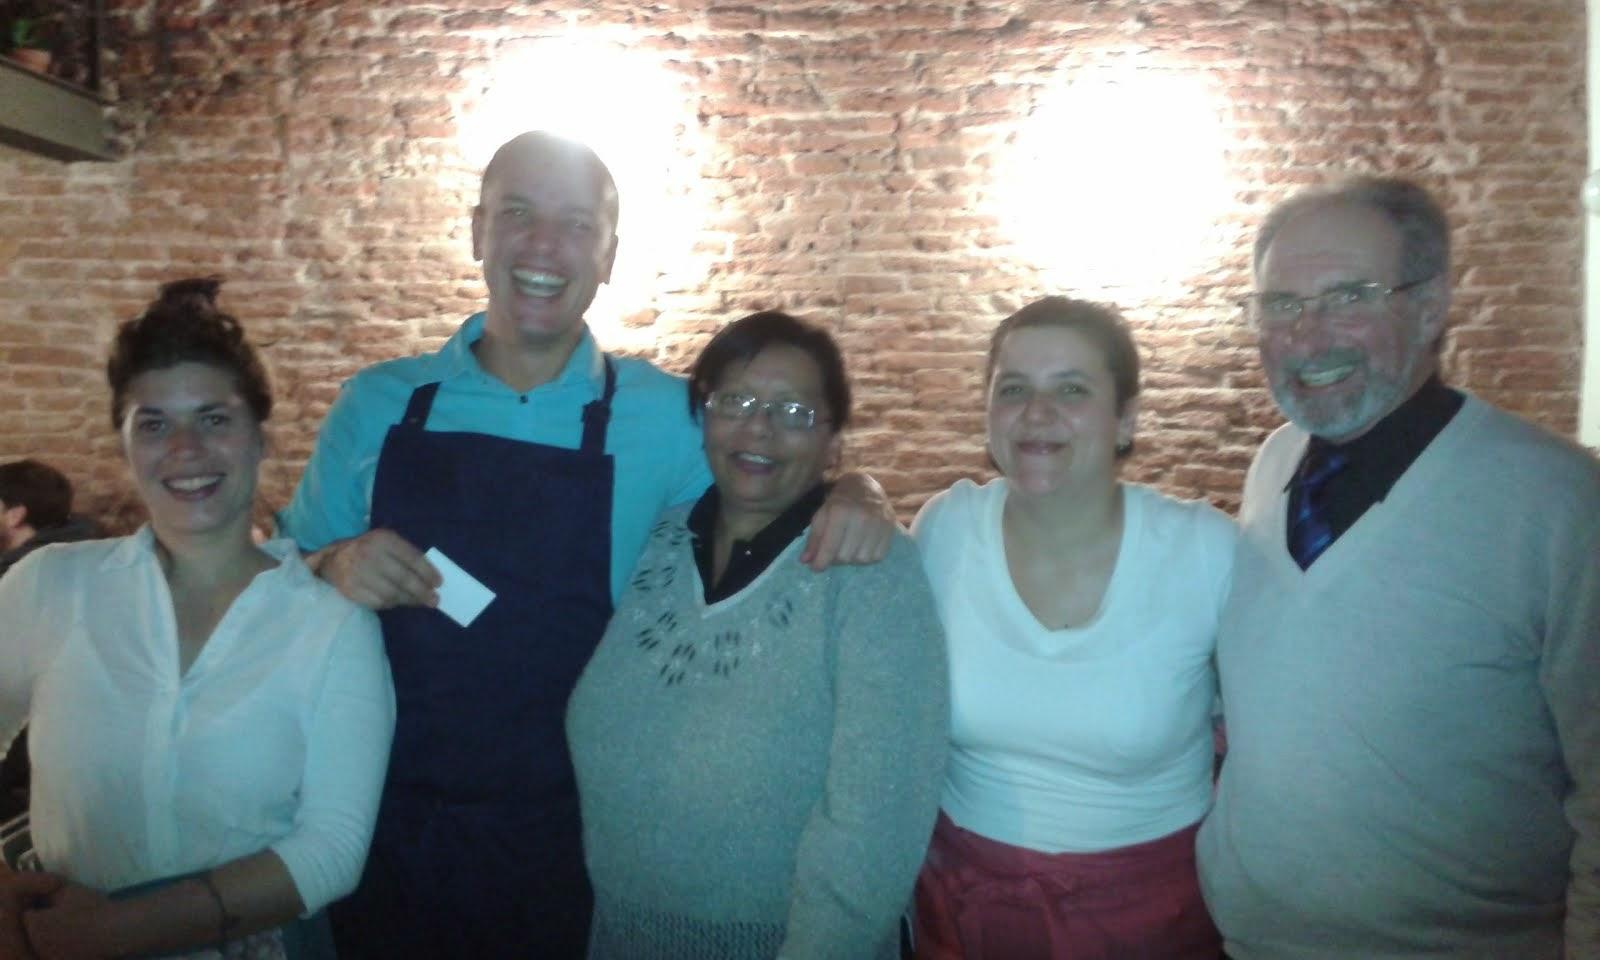 Evento bigbox - Tres chefs cocinando en vivo - 11-9-2014